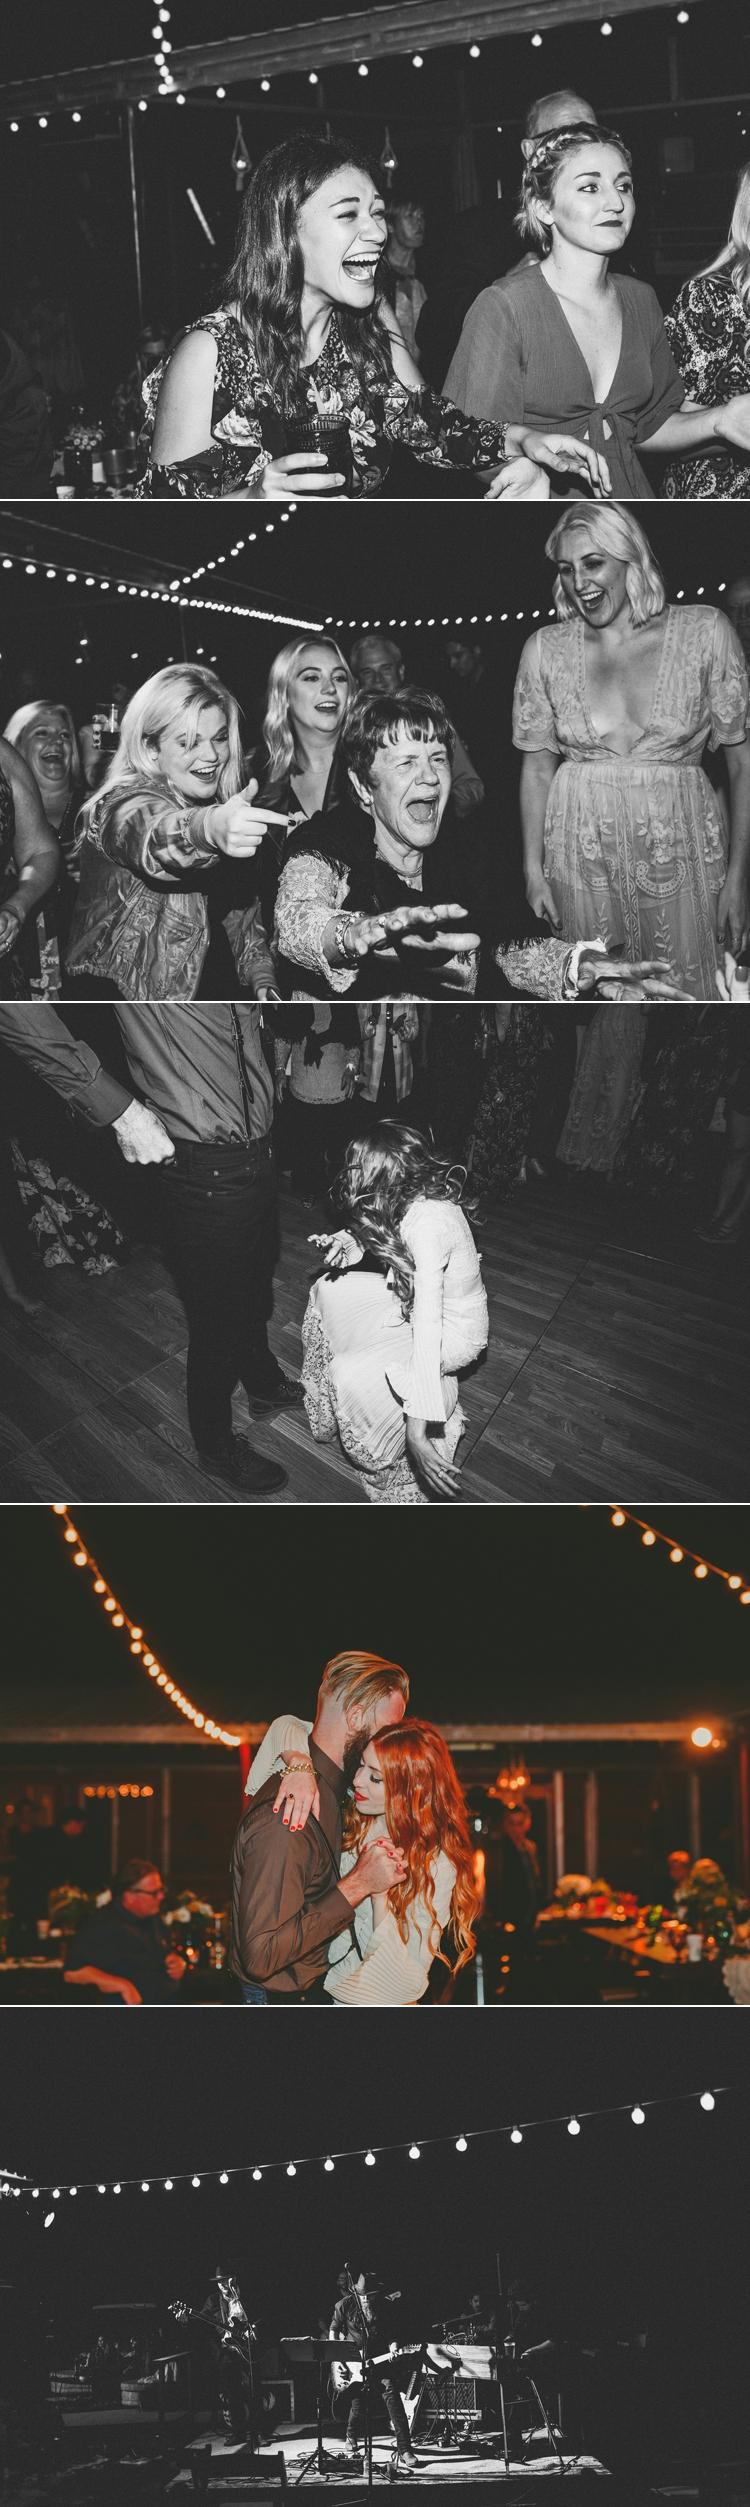 woodstock-inspired-wedding-photos-37